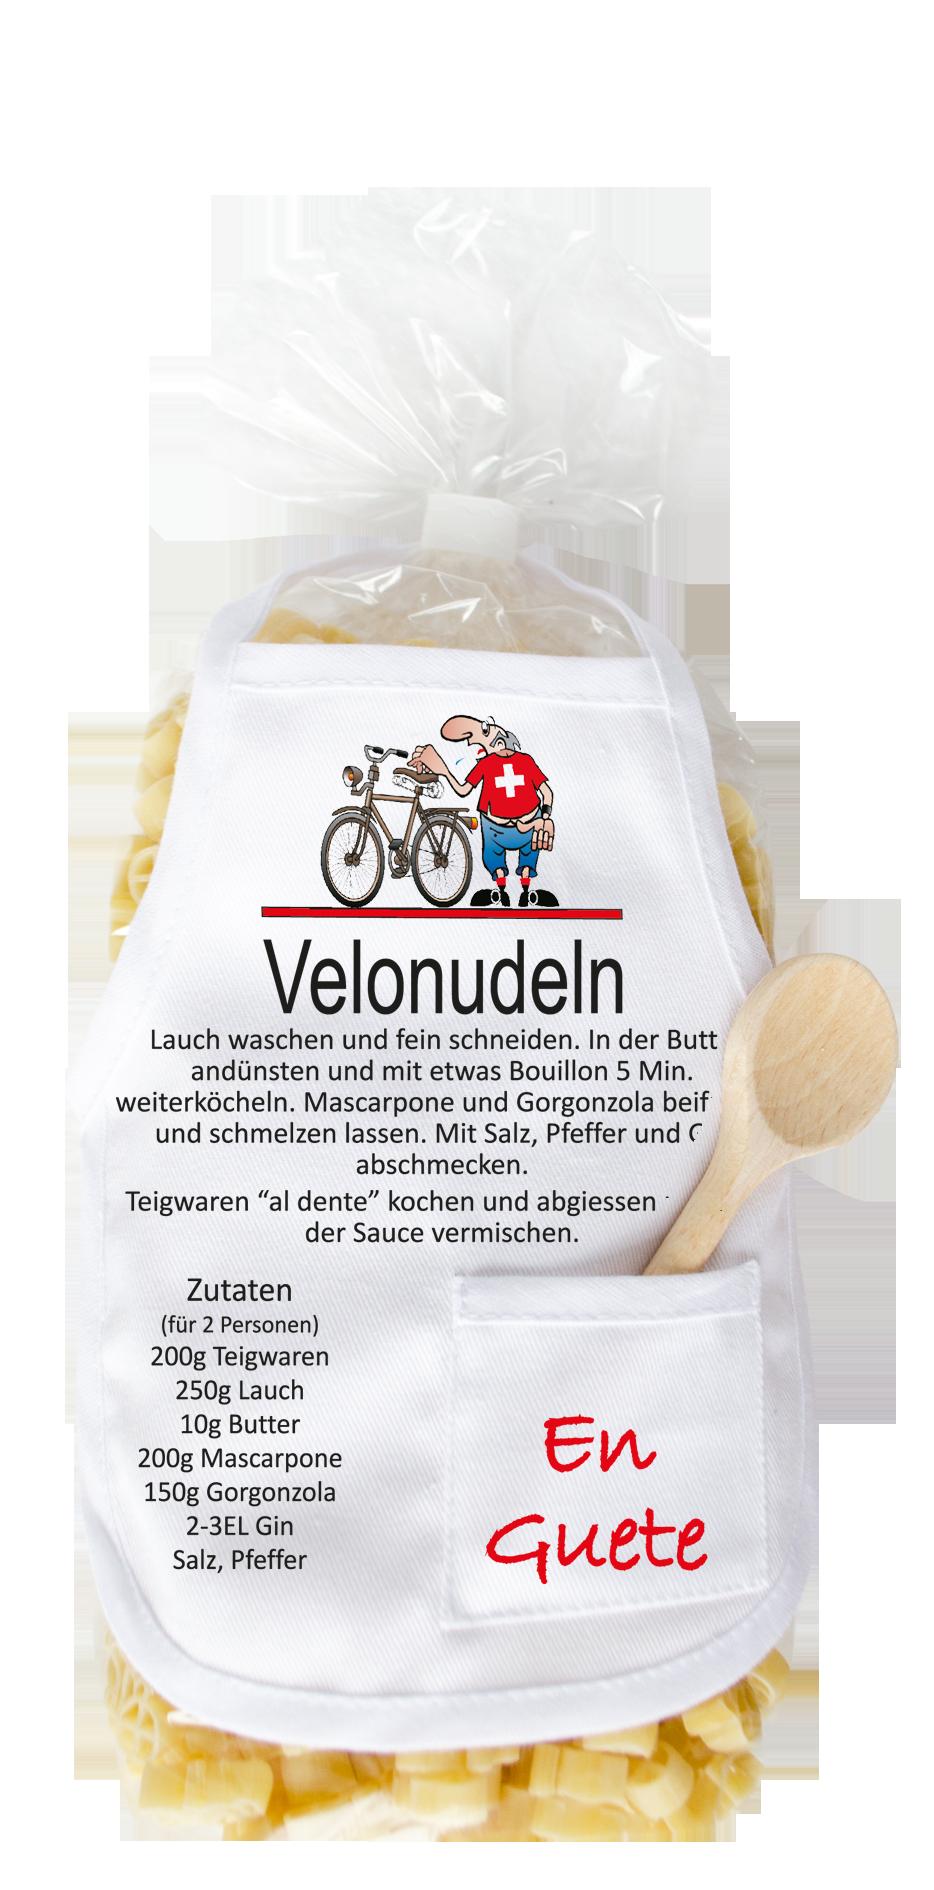 Velonudeln Velo Pasta   carina geschenke.ch